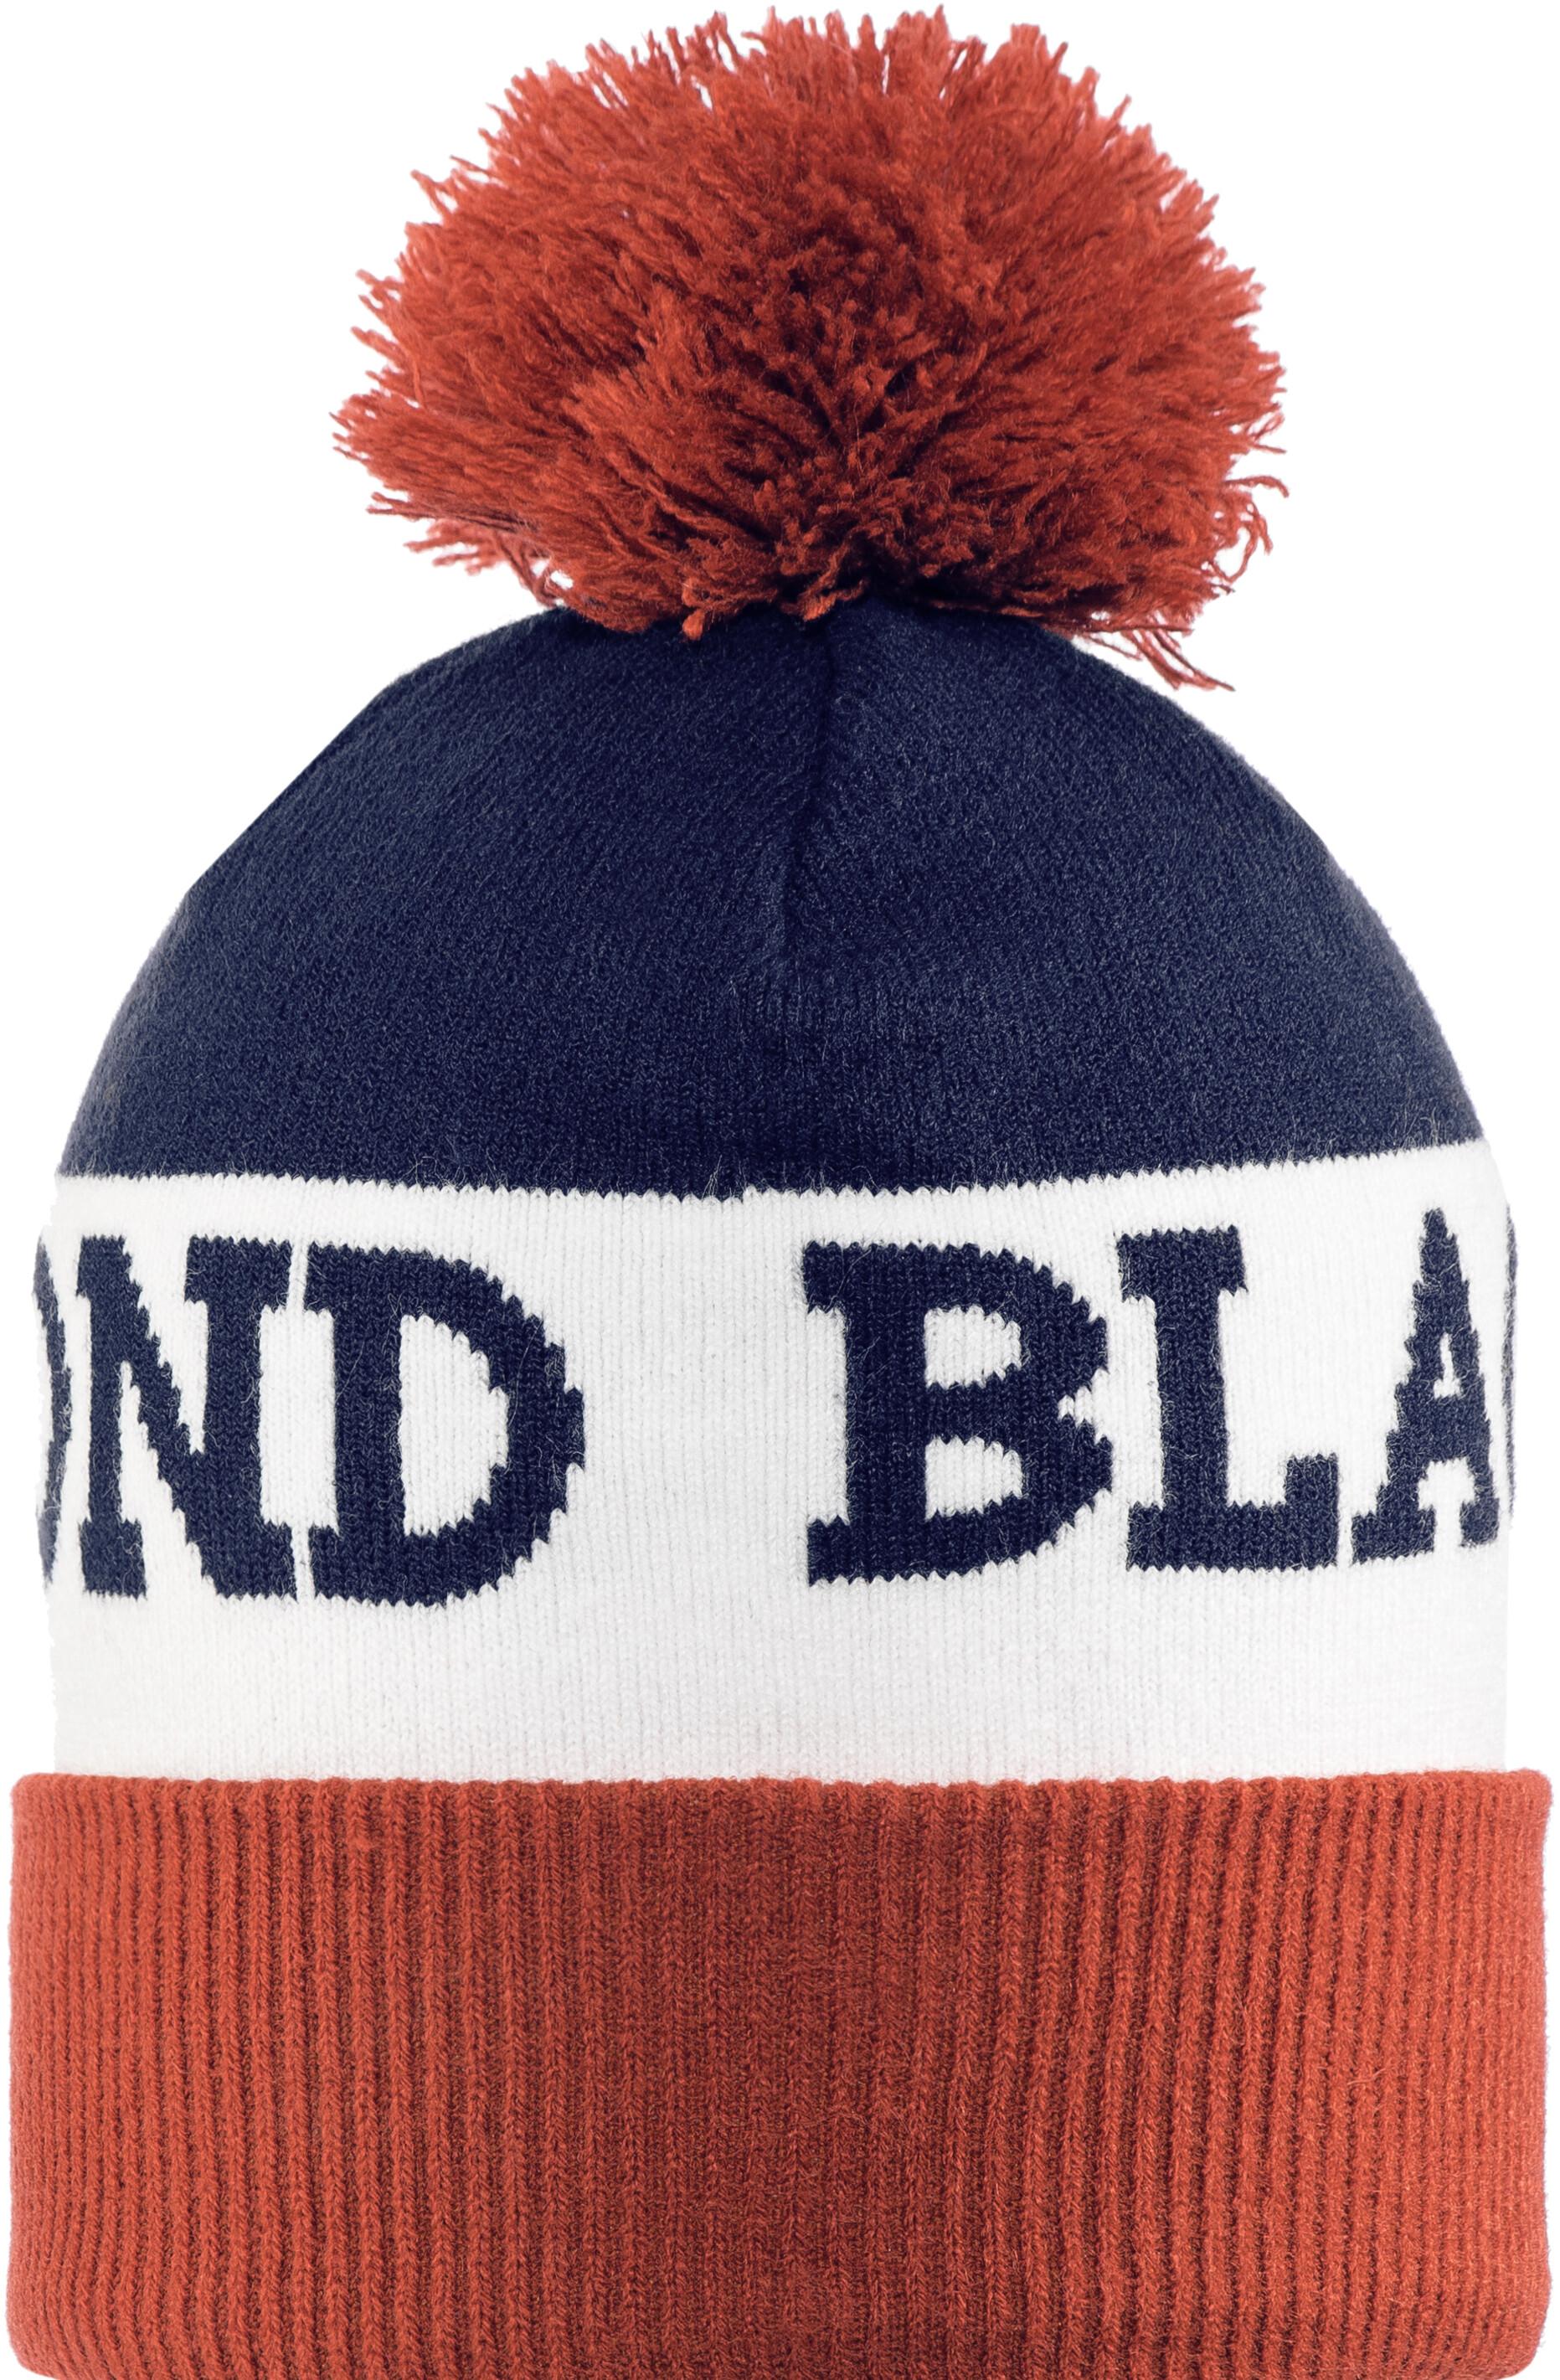 6da6d61f3e3 Black Diamond Tom Pom Headwear red blue at Addnature.co.uk